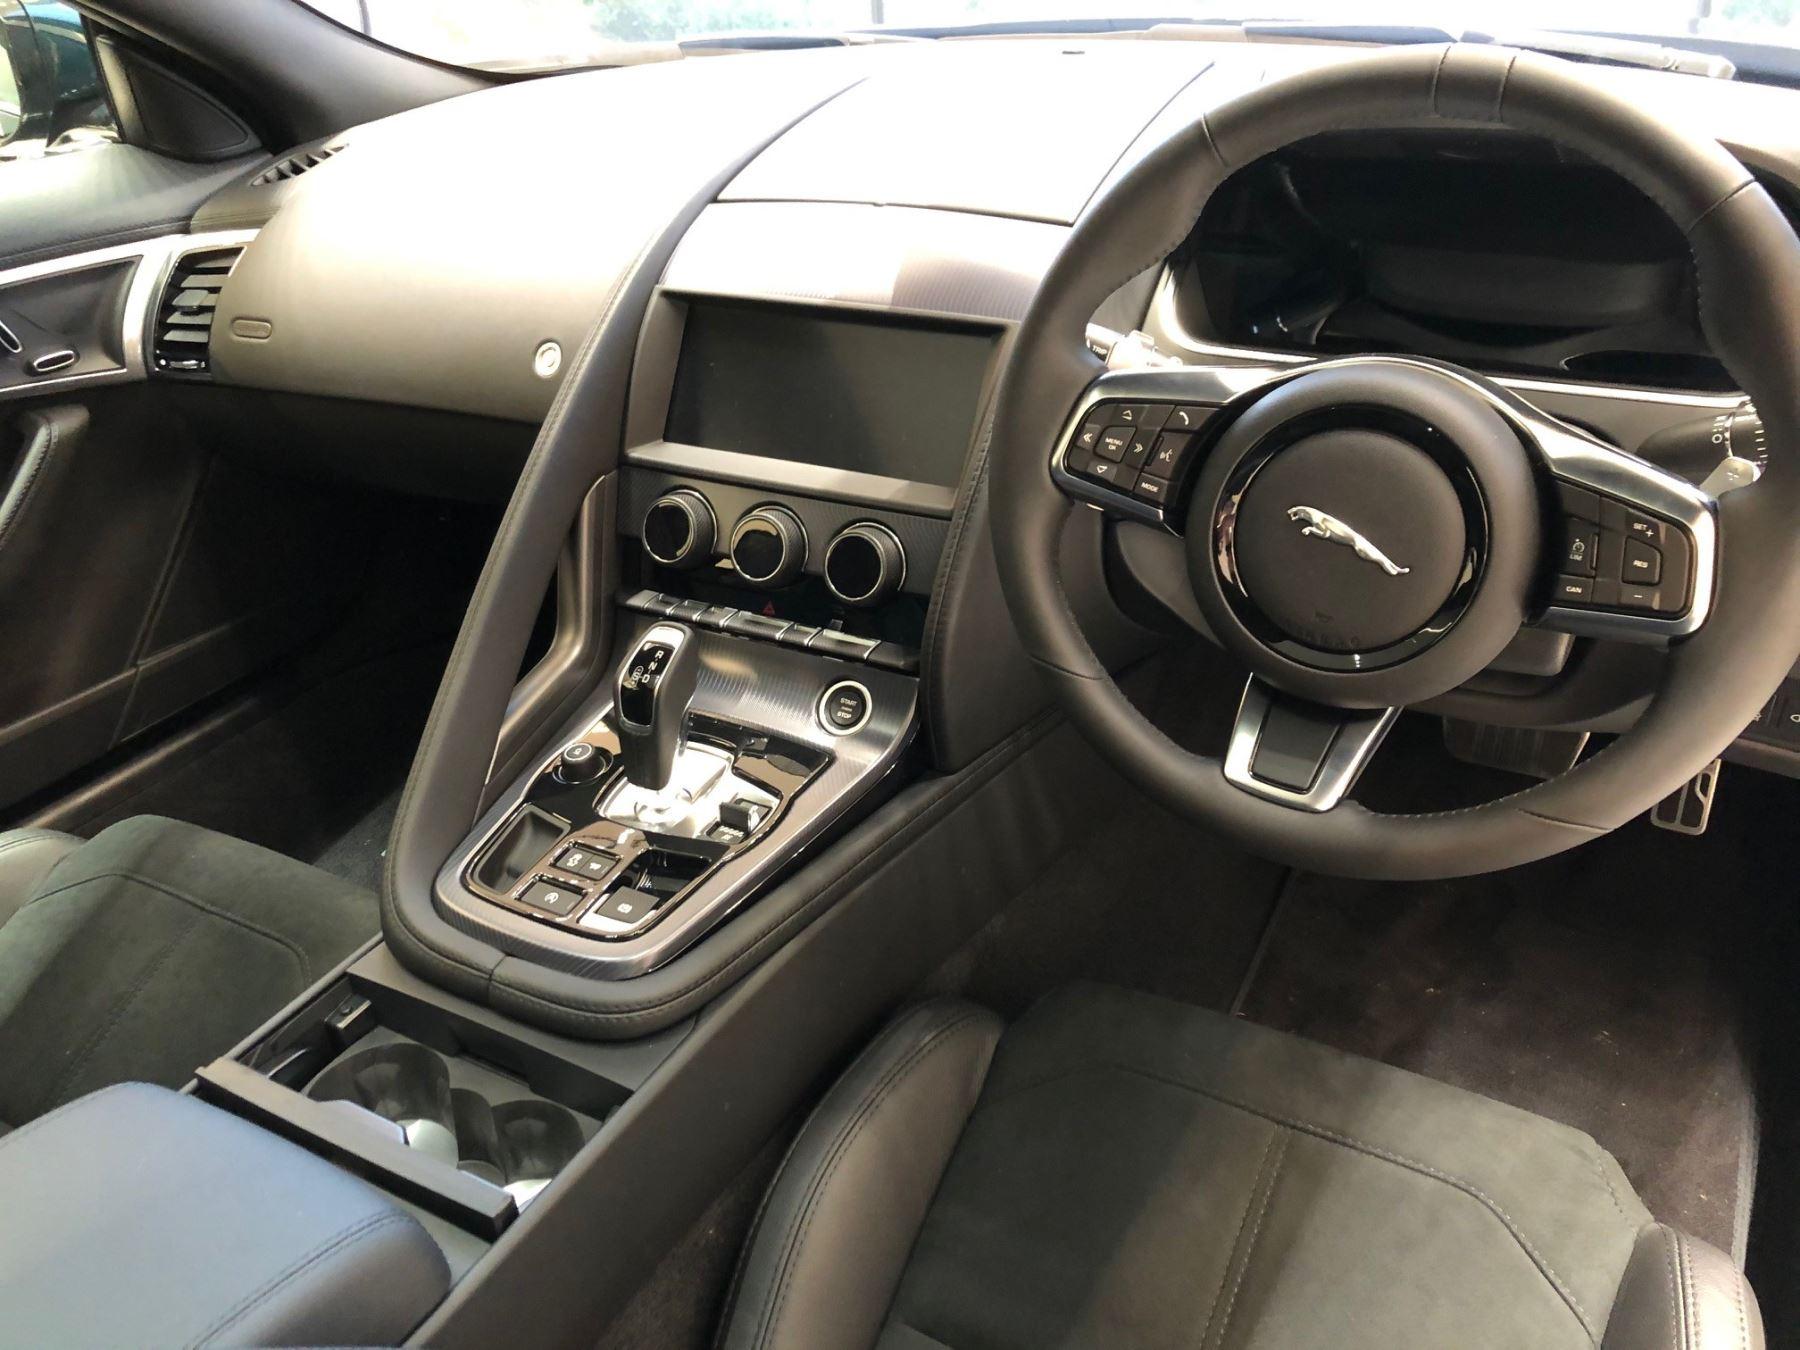 Jaguar F-TYPE Coupe Coupe 2.0 P300 RWD R-Dynamic image 5